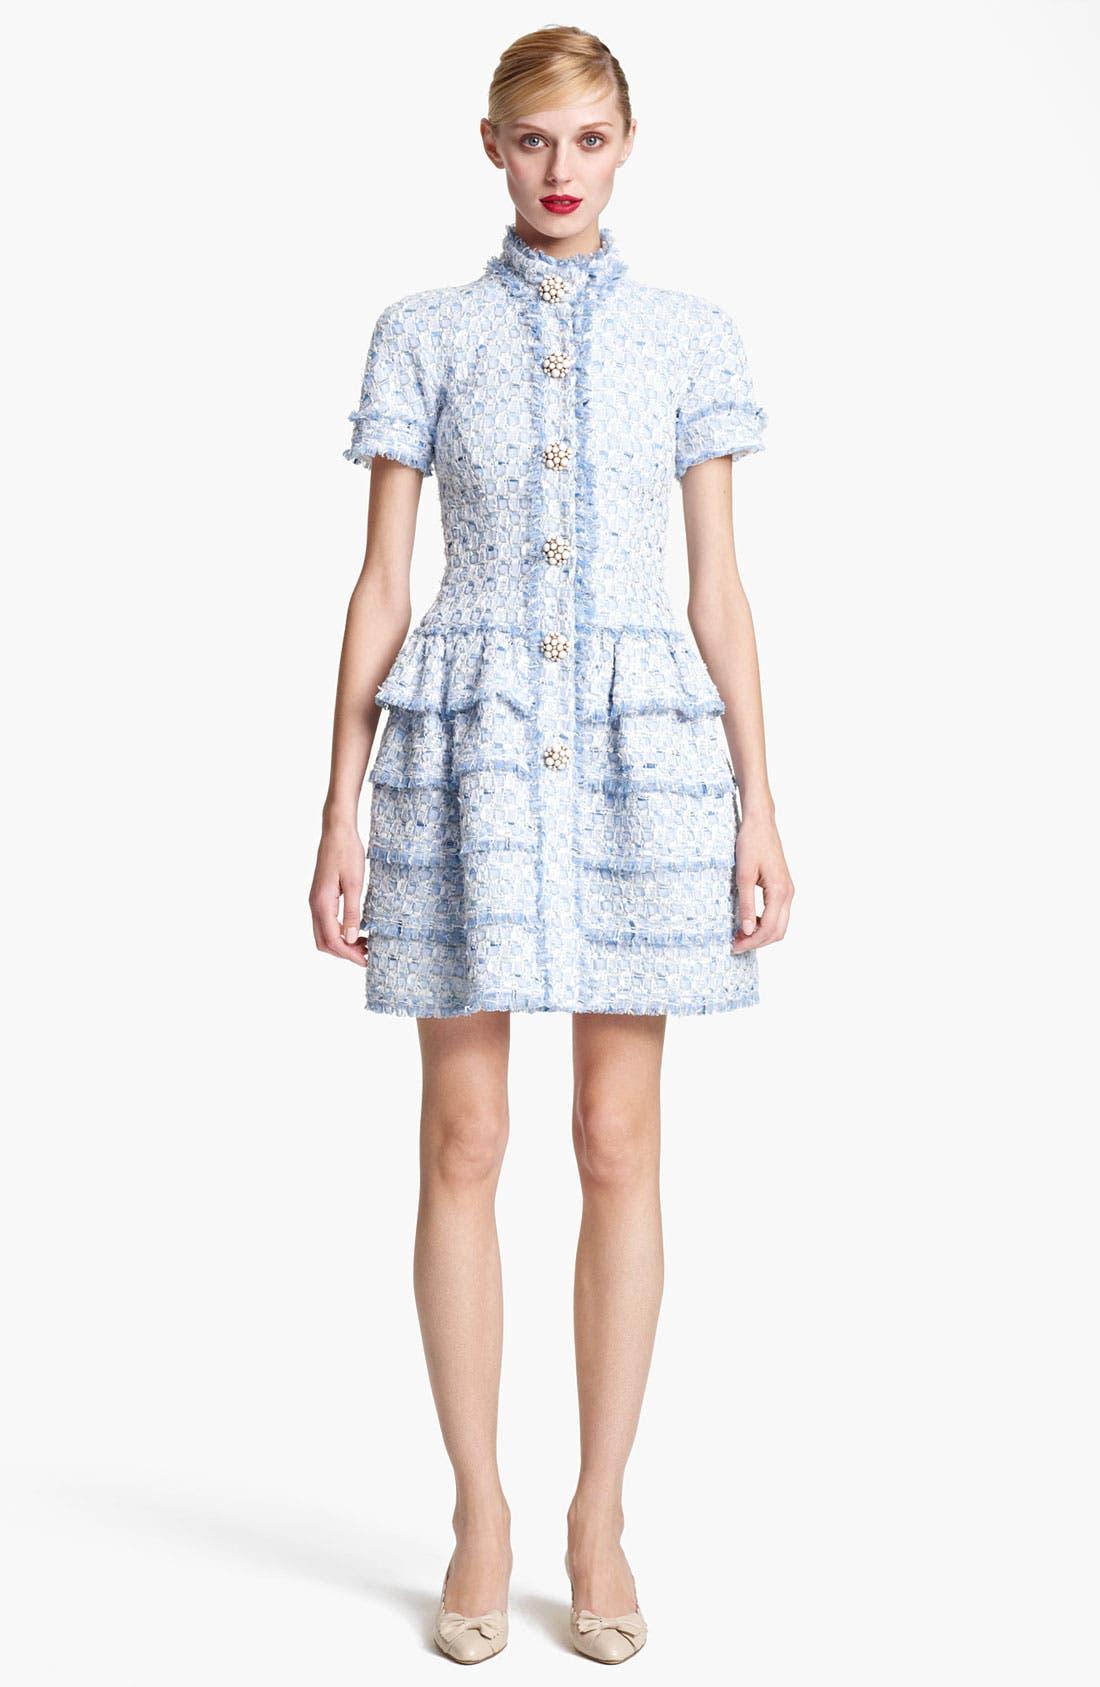 Alternate Image 1 Selected - Oscar de la Renta Tiered Tweed Dress